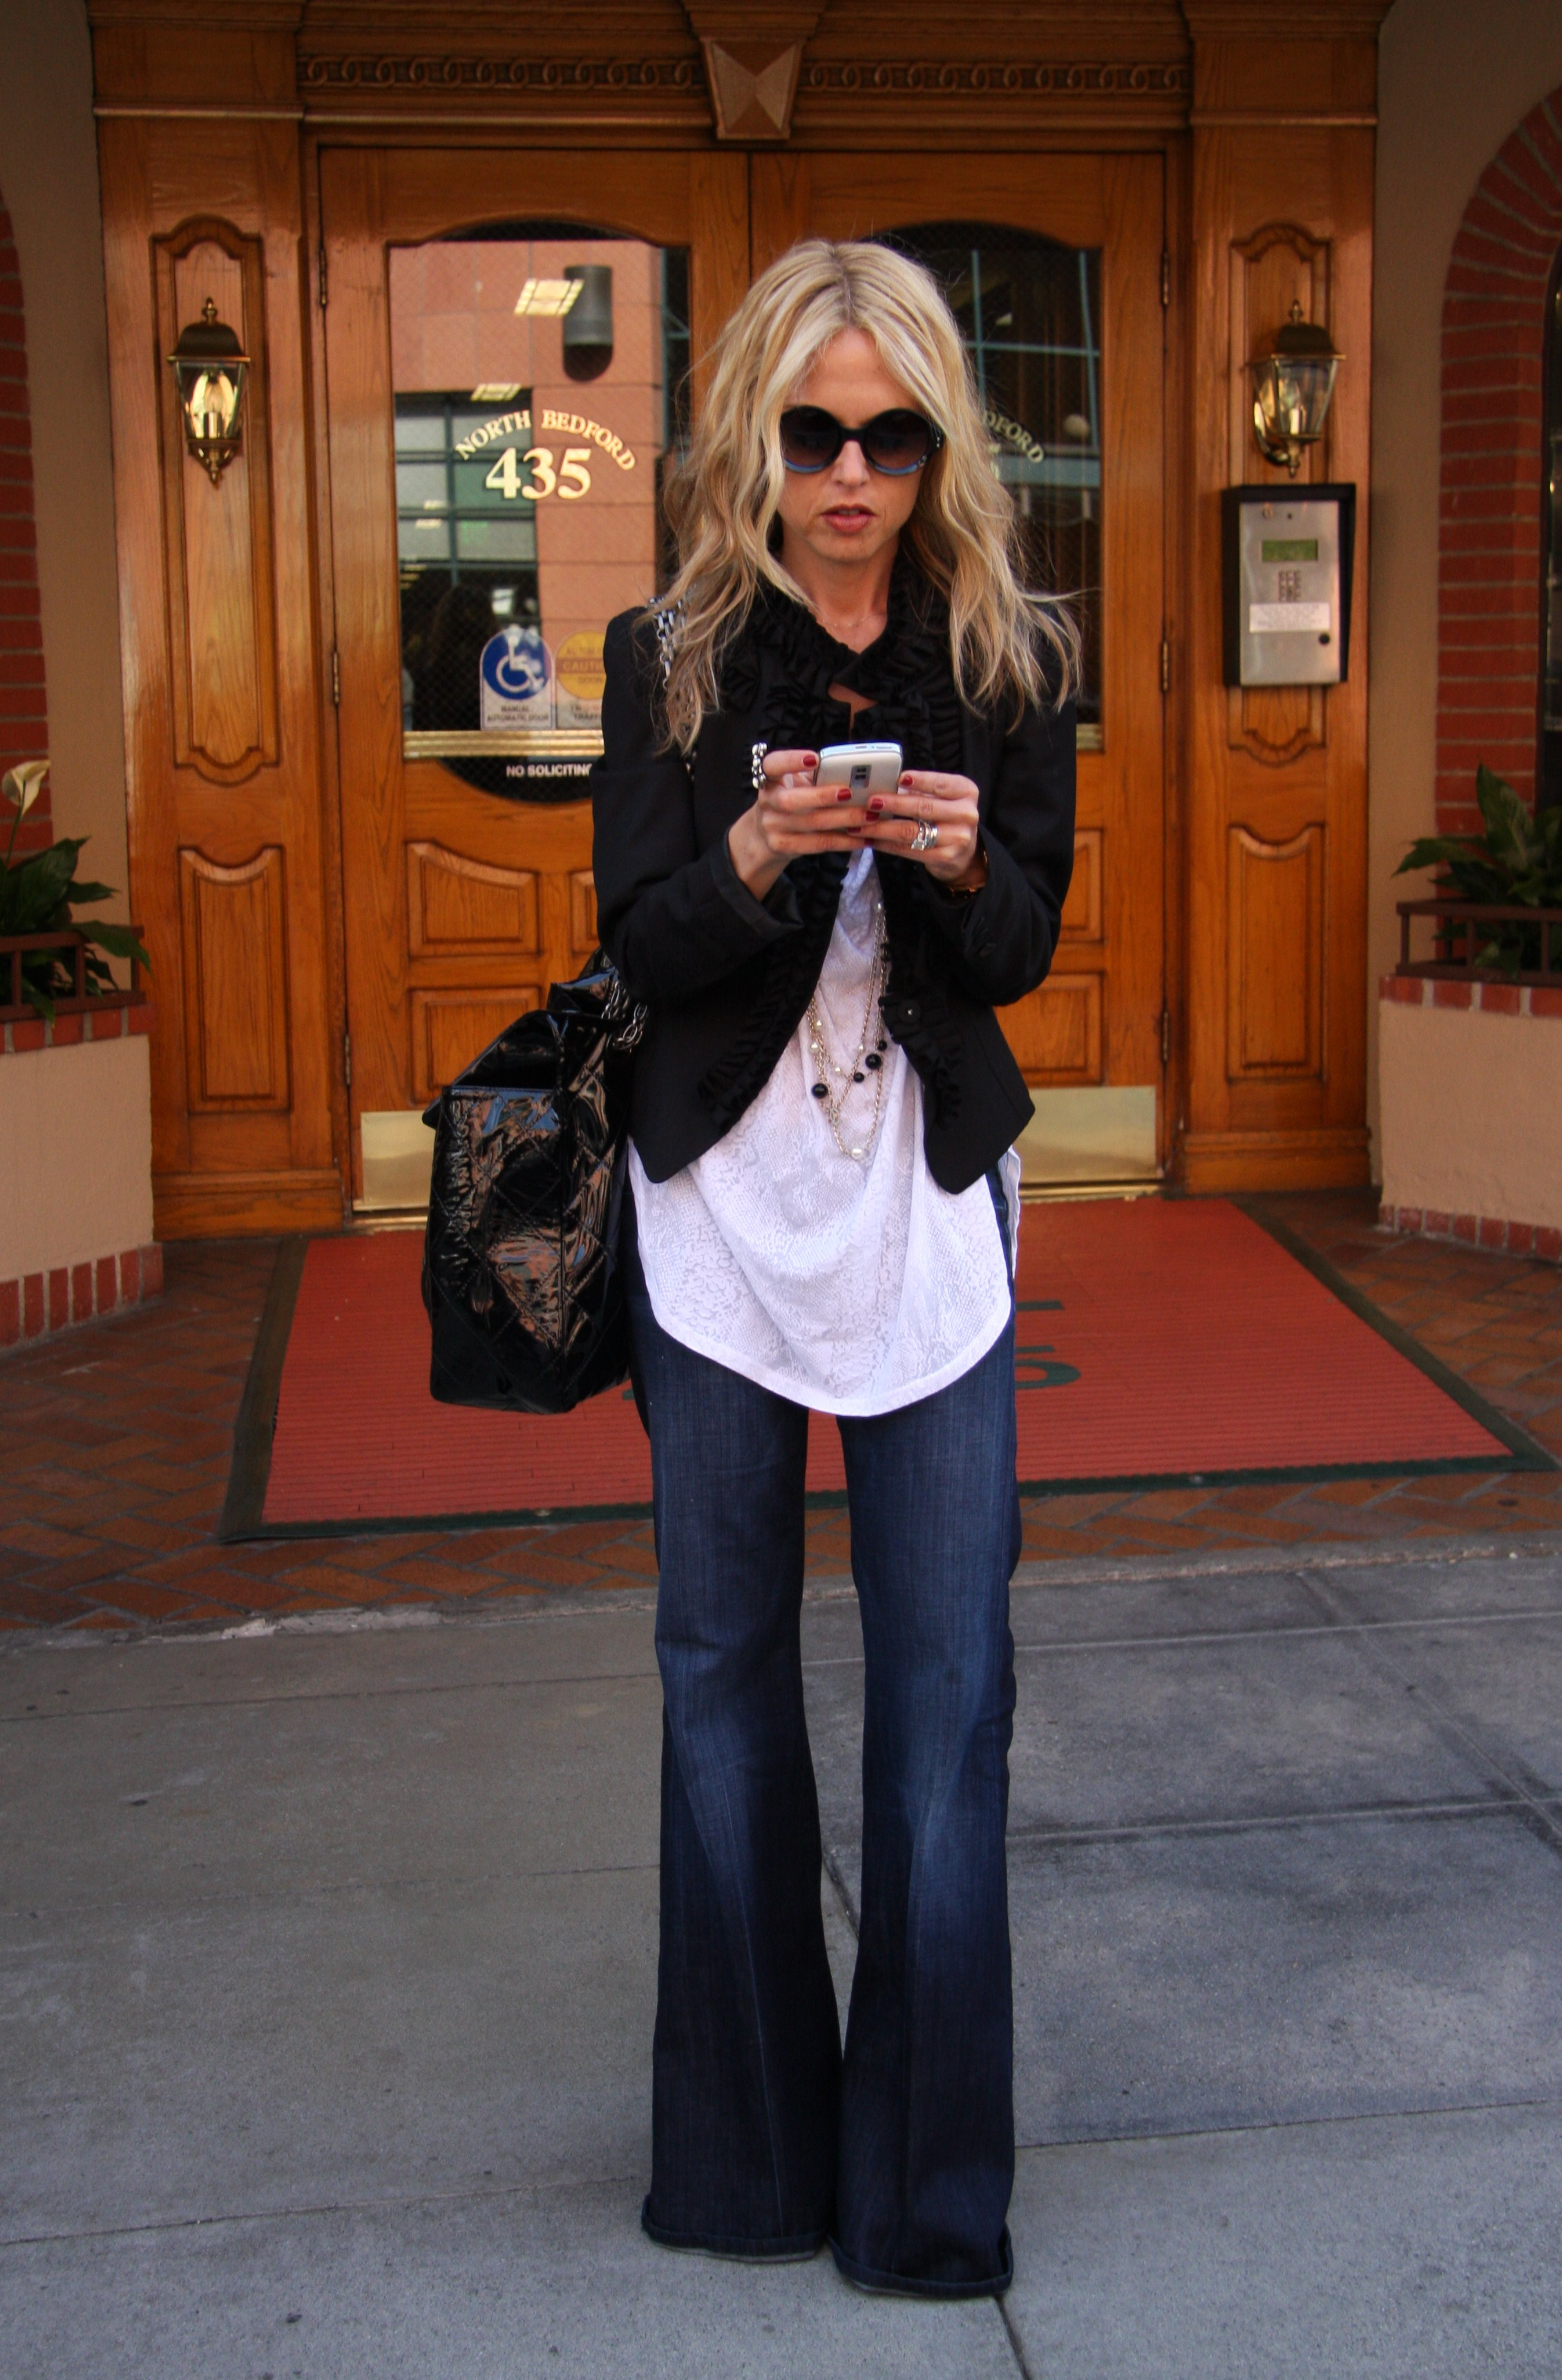 Love Rachel Zoe's style